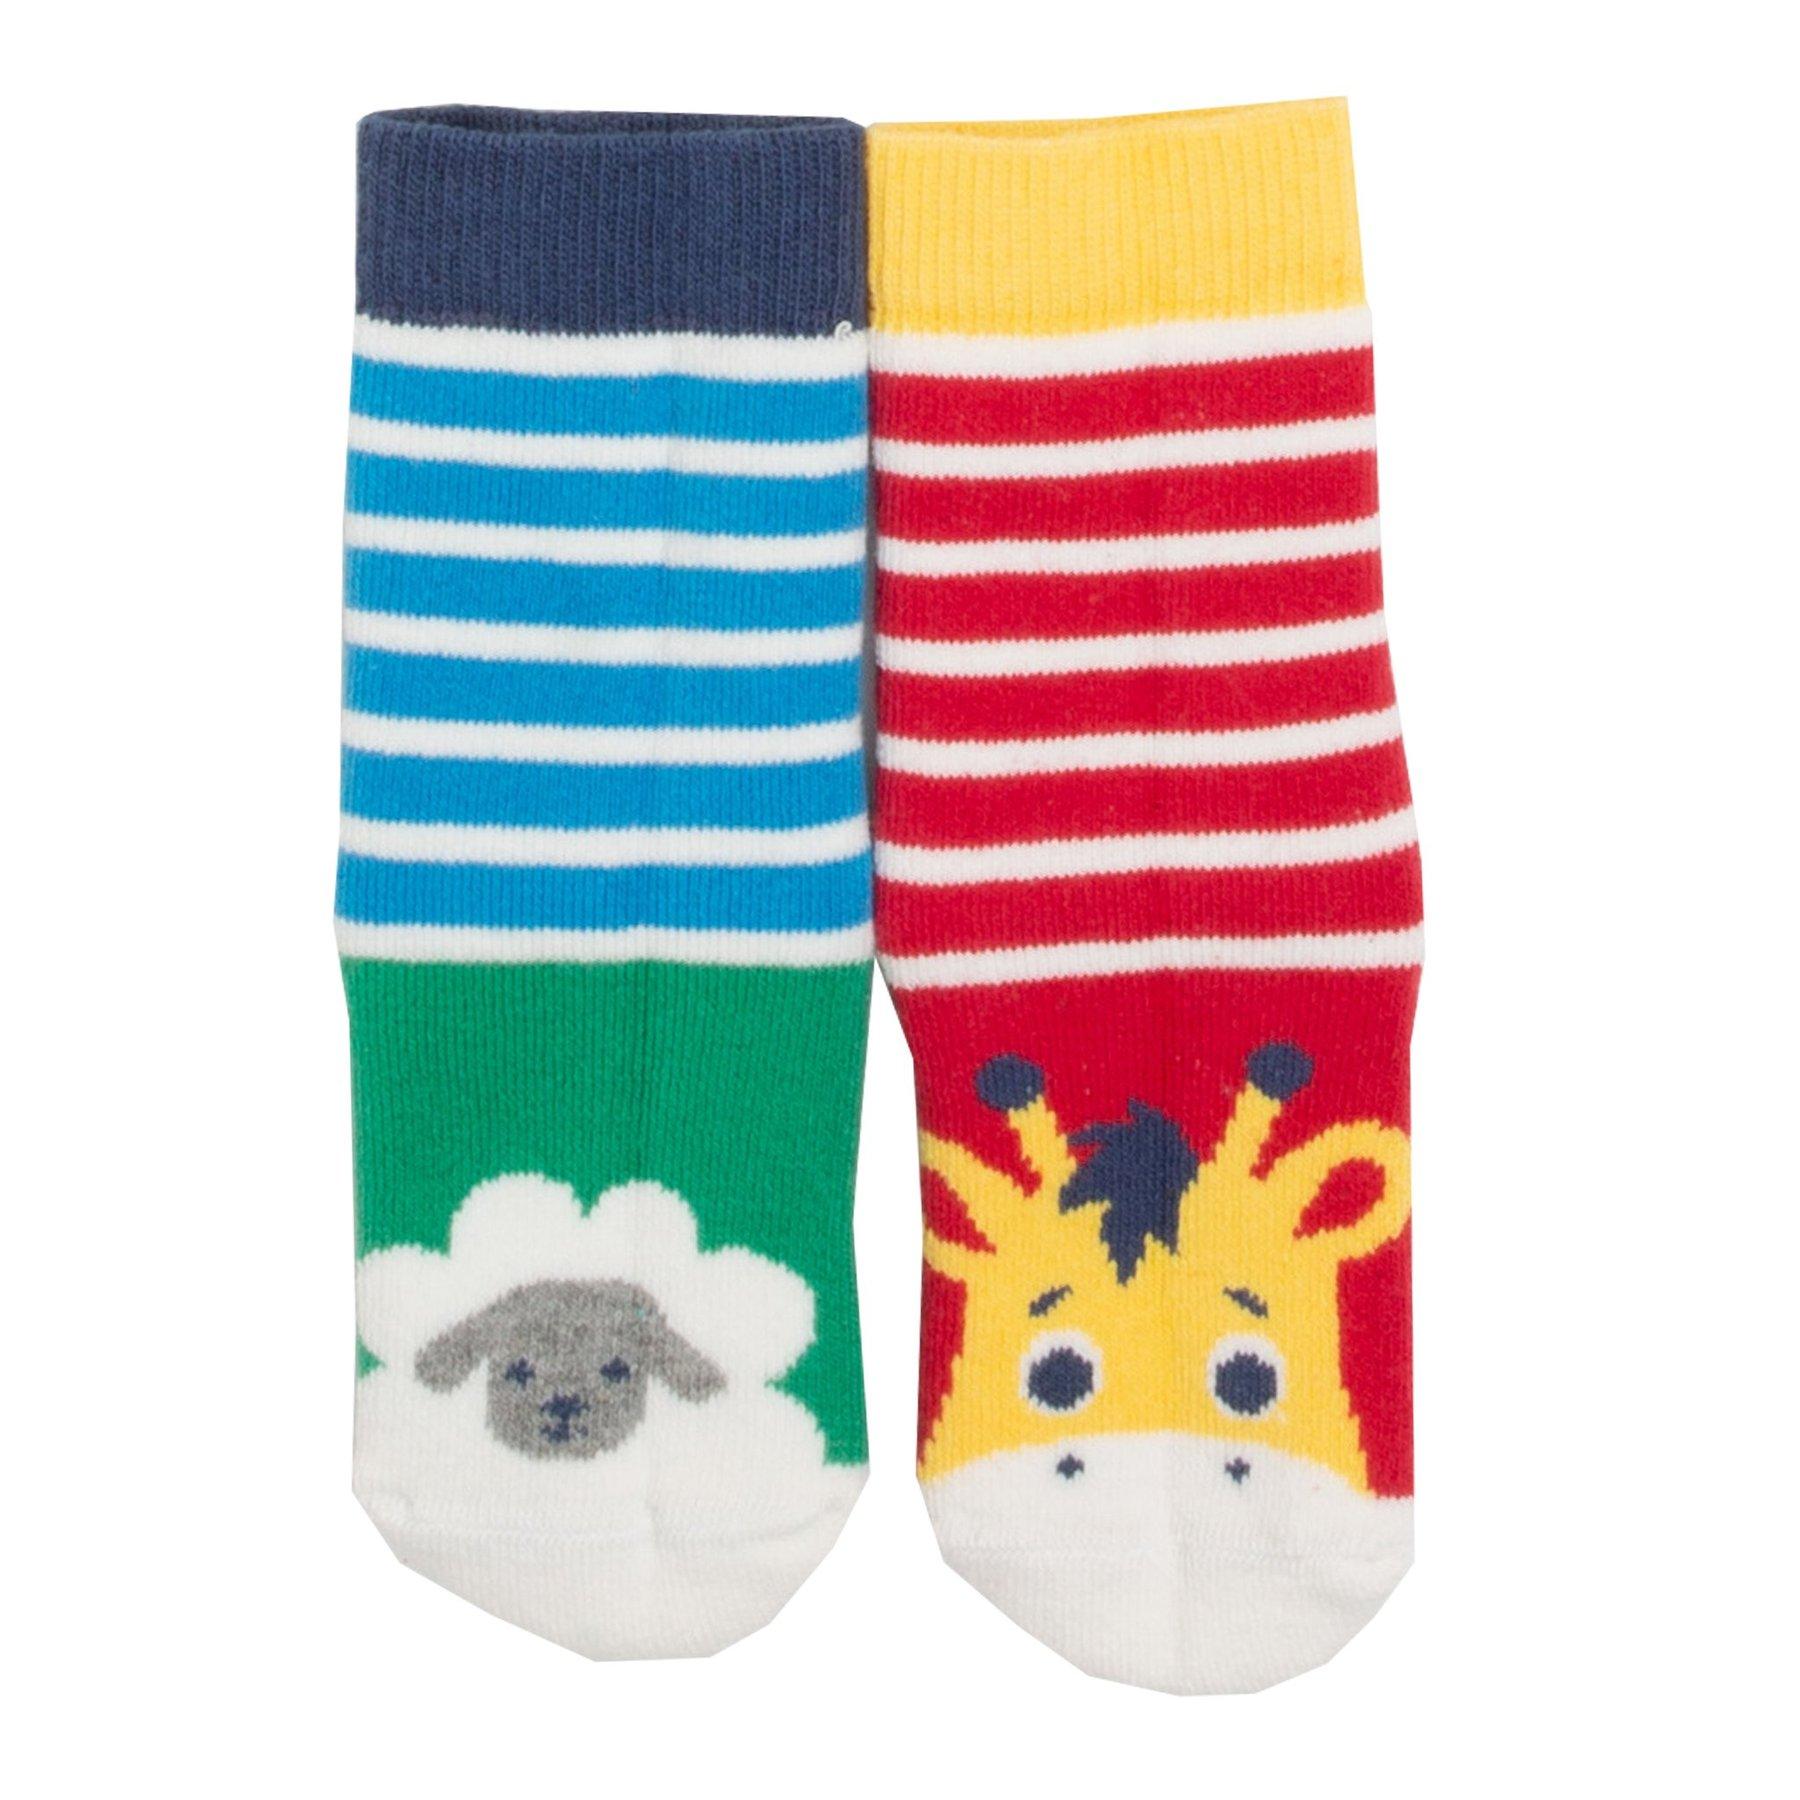 Kite 2 Pack Grippy Socks - Sheep/Giraffe